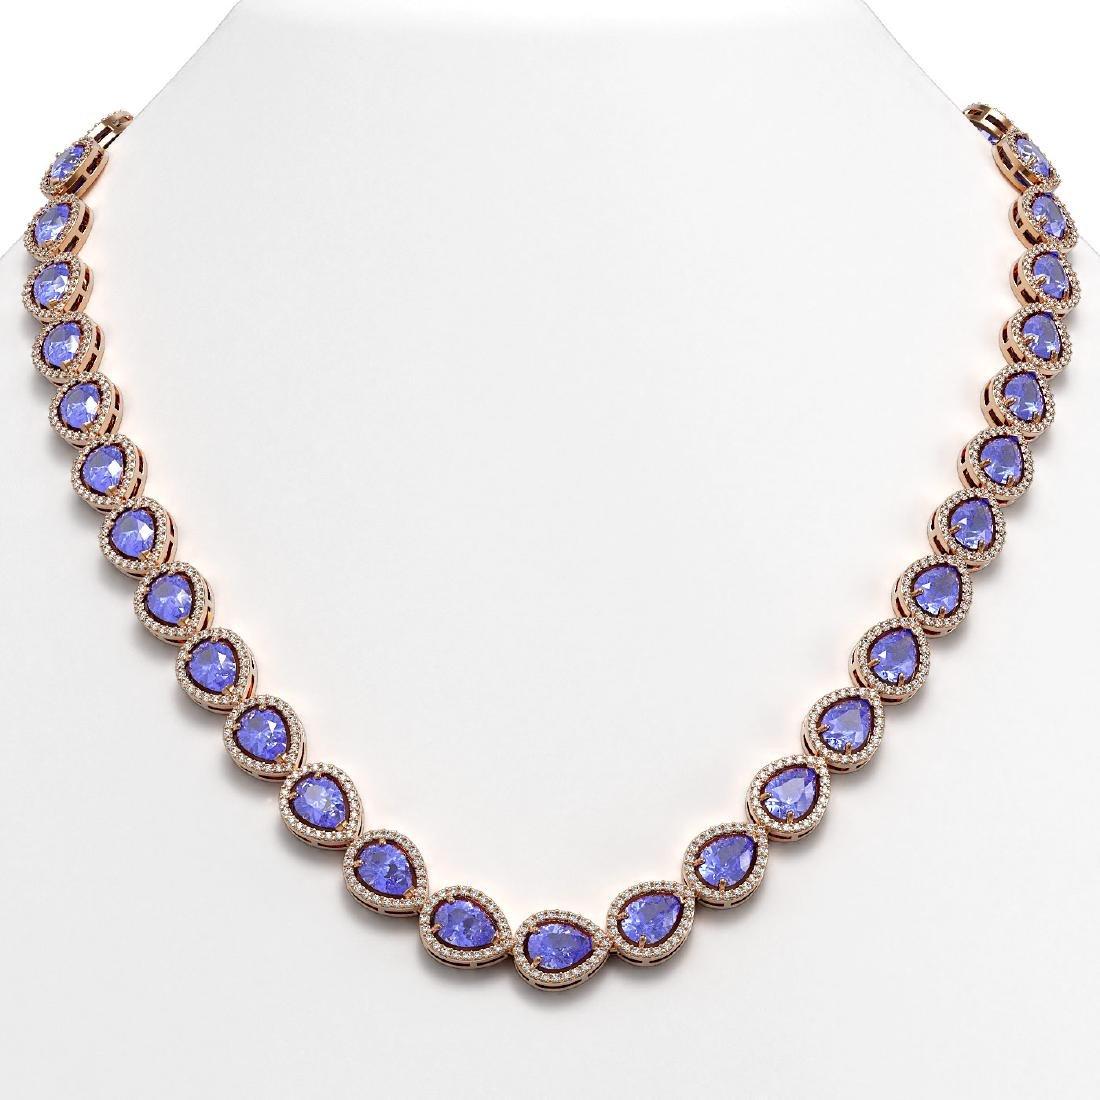 40.53 CTW Tanzanite & Diamond Halo Necklace 10K Rose